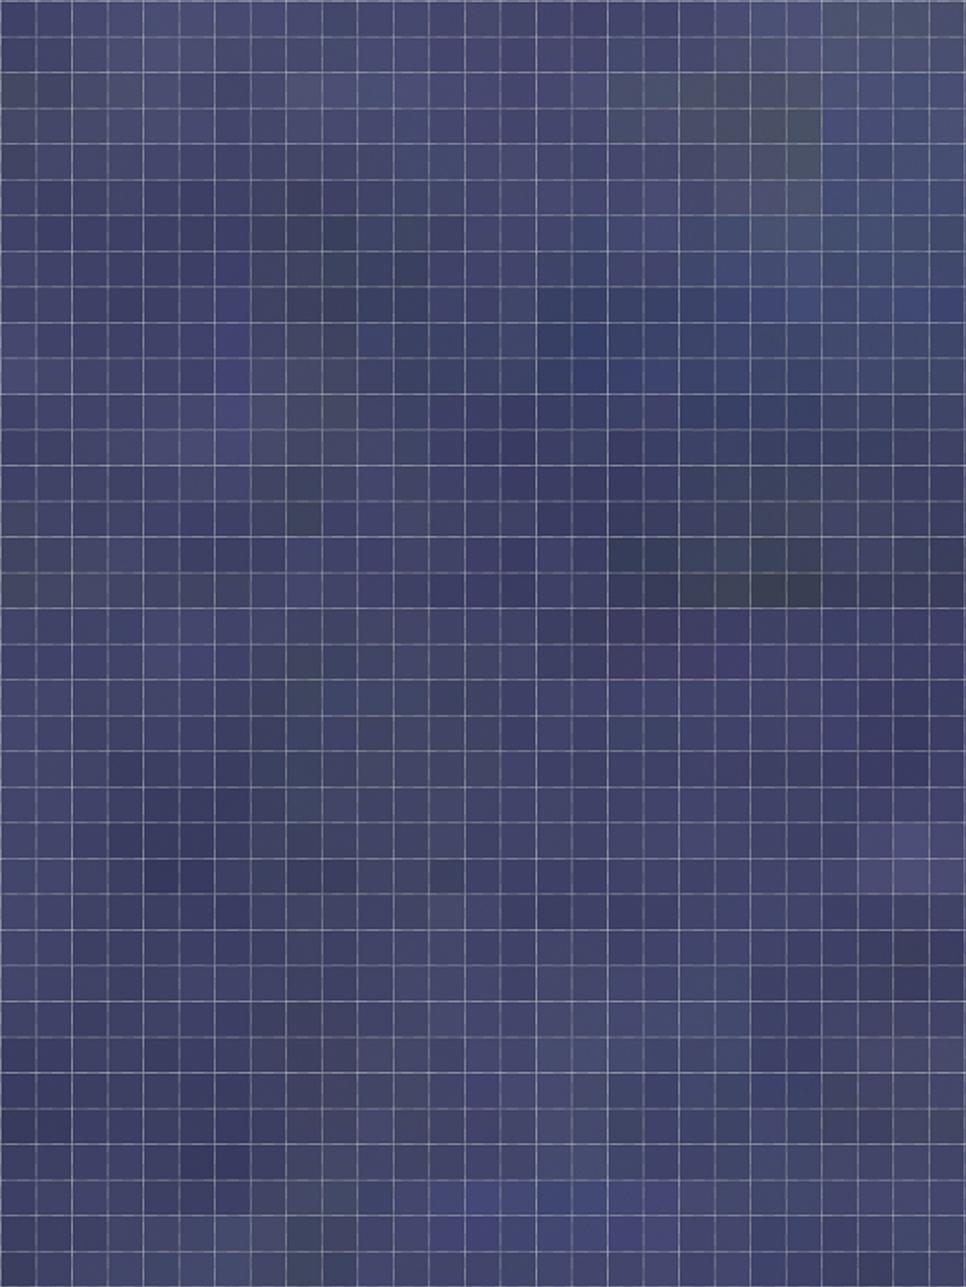 pixel6.jpg